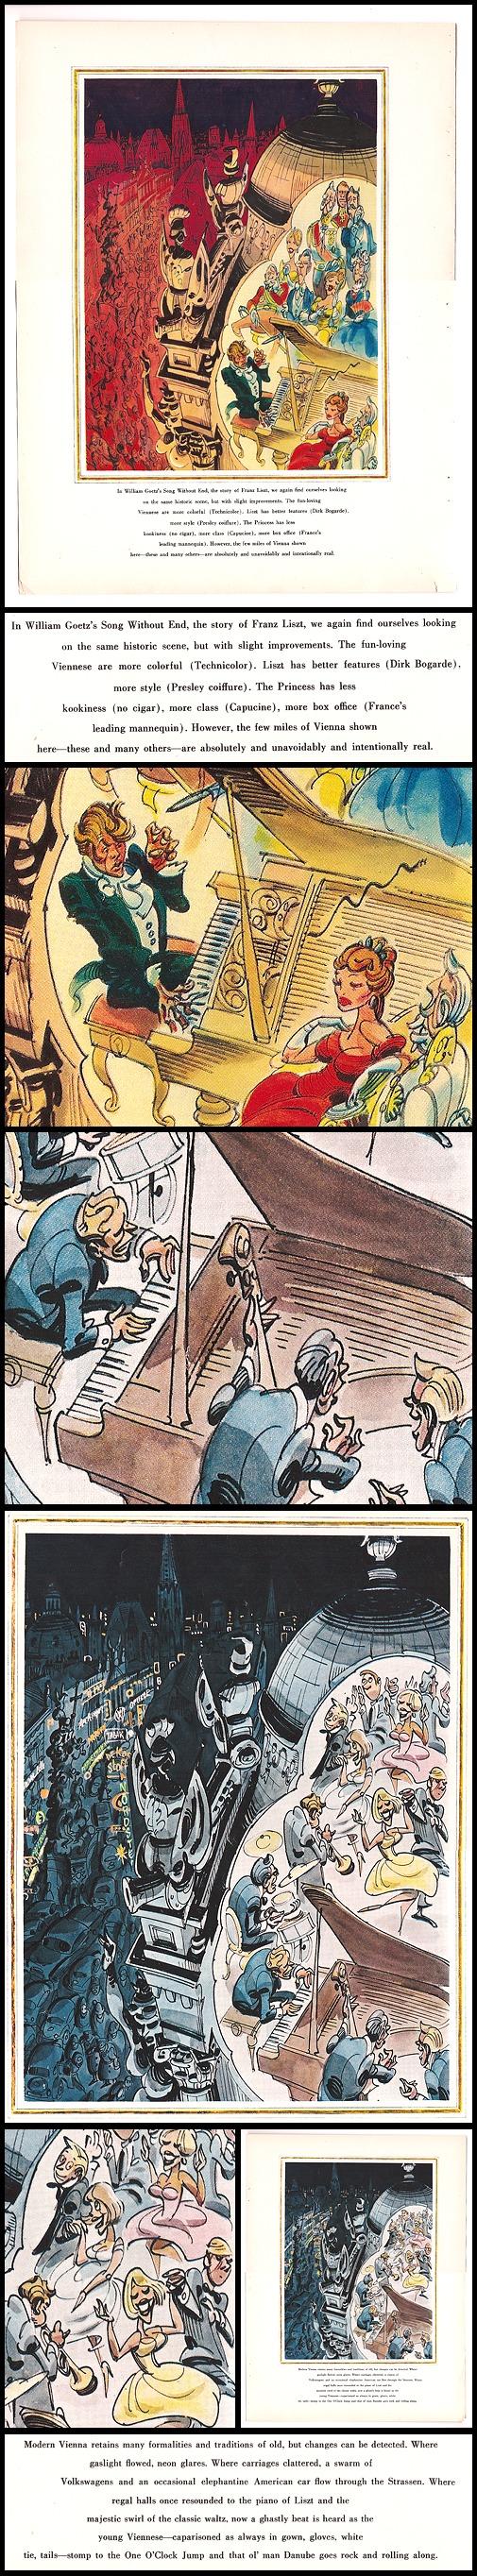 "46. Esquire: ""Vienna, Views #2 (Hollywood) & #3 (Harvey Kurtzman)"" Tearsheets (Jun 1960)"